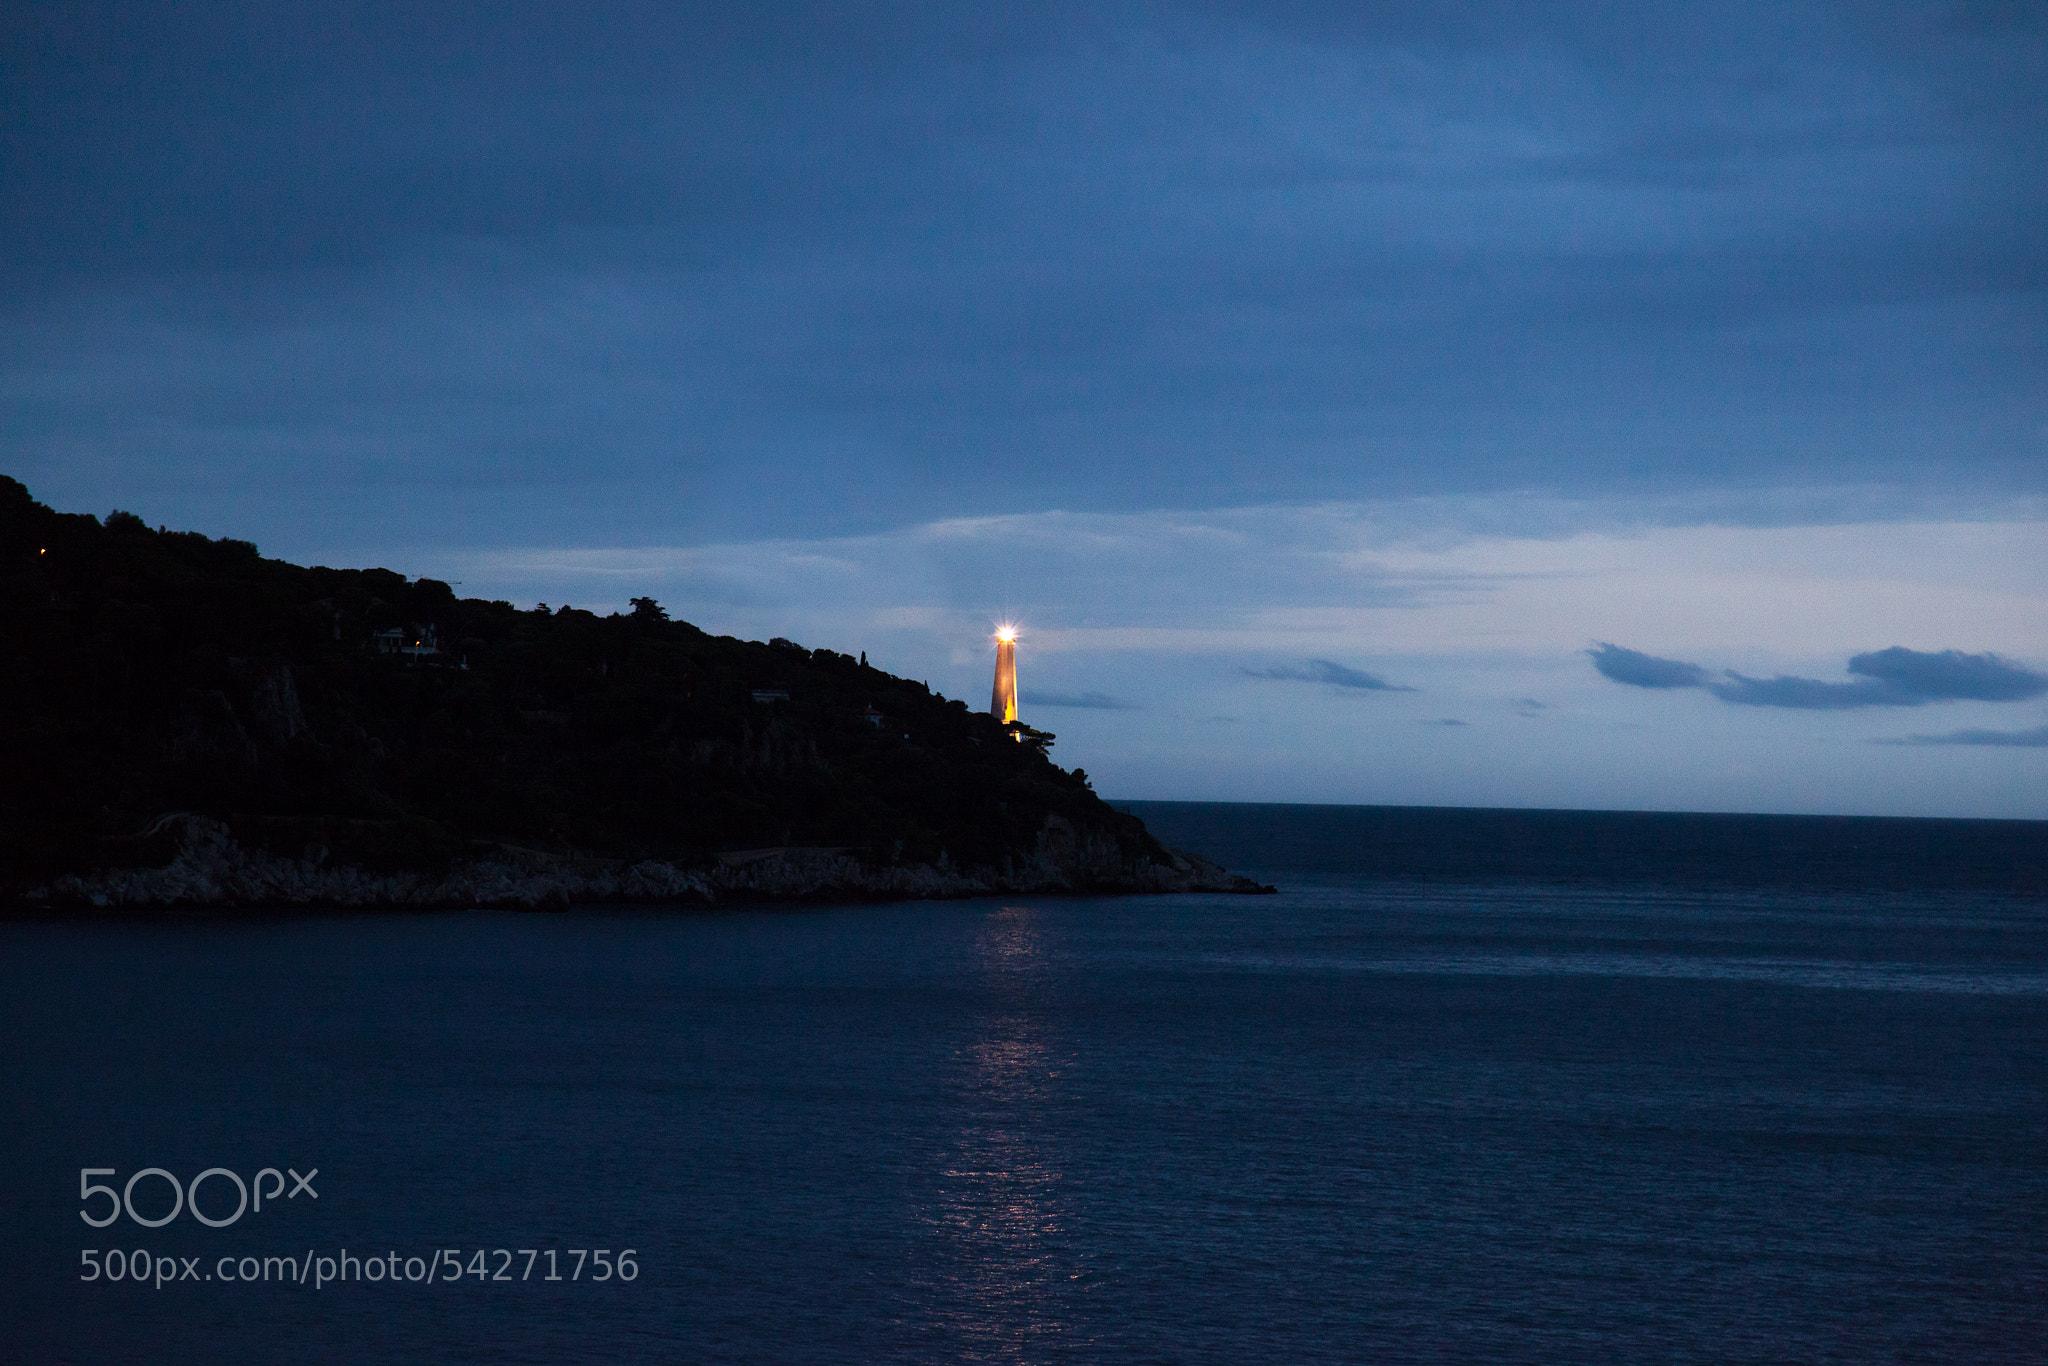 Photograph Lighthouse by Frank Hodum on 500px